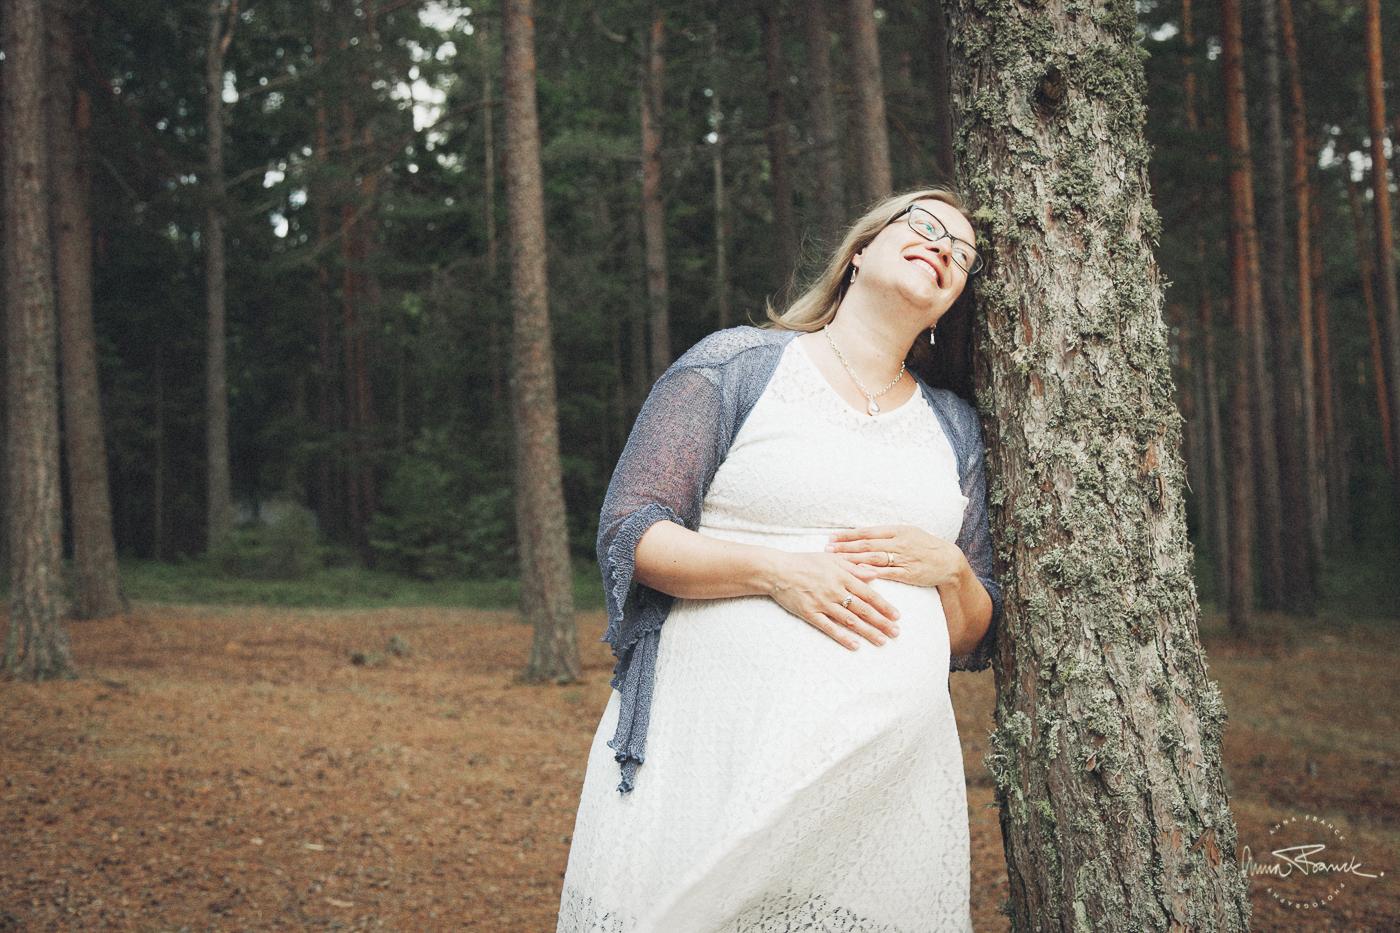 anna, franck, photography, stockholm, pargas, photographer, stockholmfotograf, gravid, pregnancy, raskaana, gravidbilder, mustfinn, sunset, softlight, natural, motherhood, mamma, äitiys